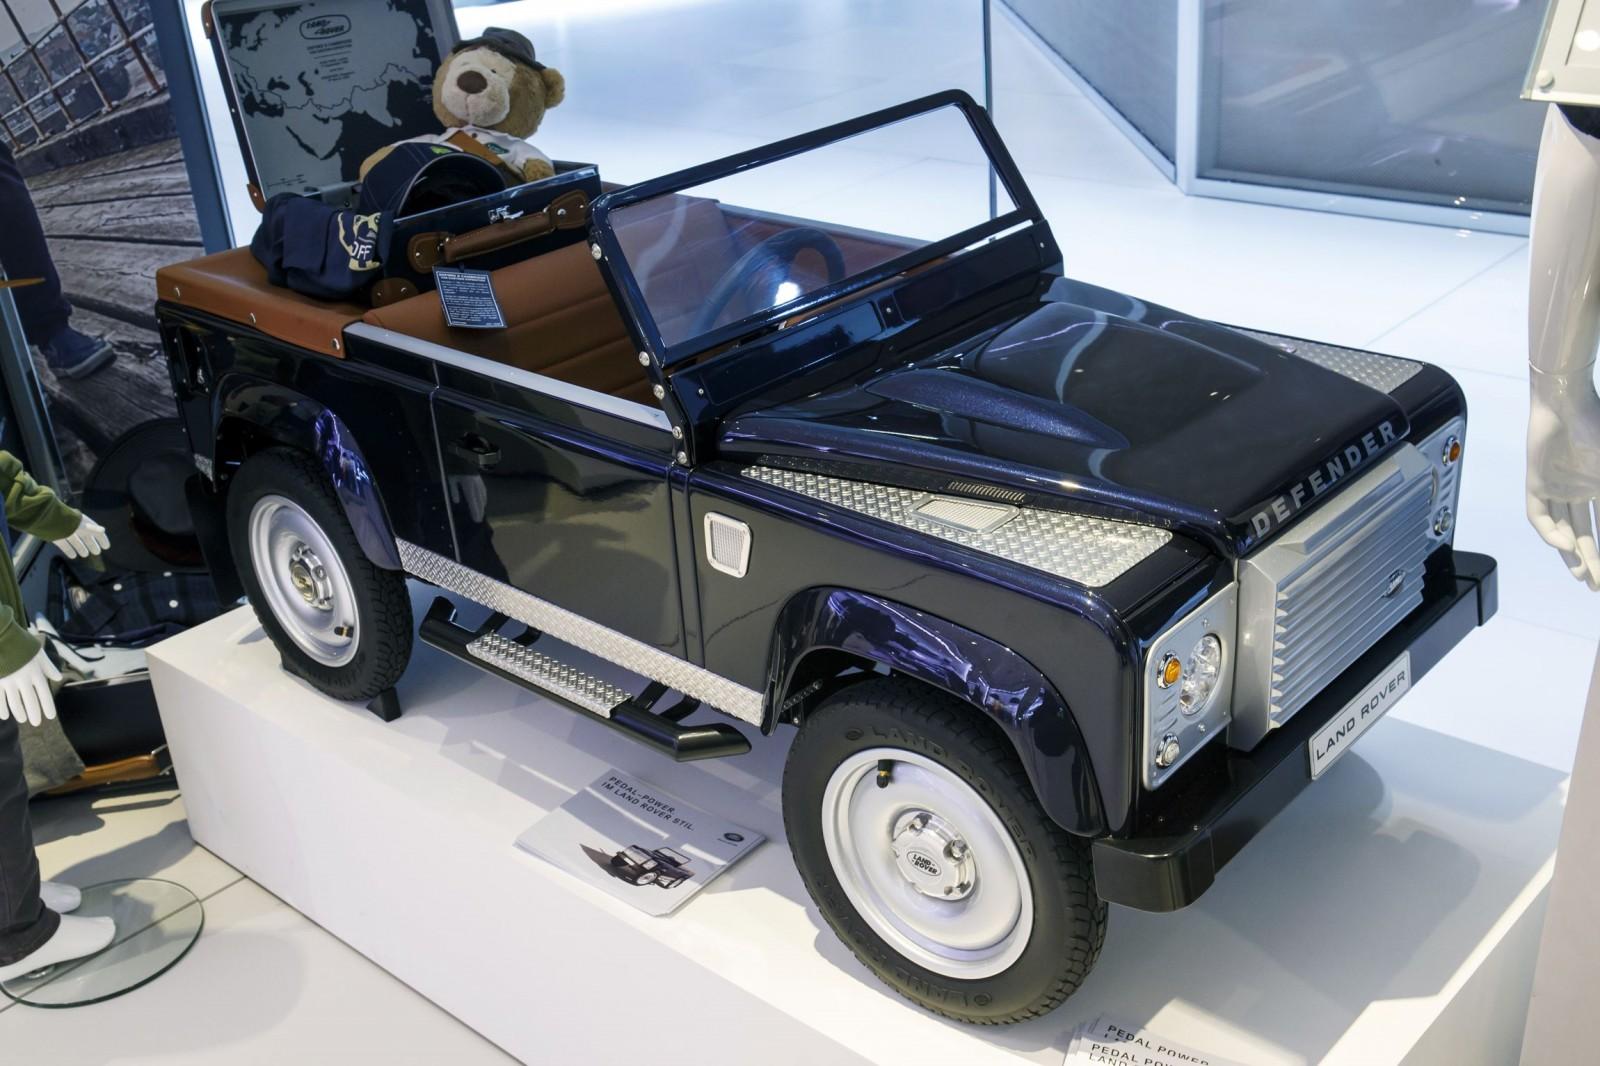 http://www.car-revs-daily.com/wp-content/uploads/2015/09/Jaguar-Land-Rover-2015-Frankfurt-IAA-Mega-Gallery-112-1600x1066.jpg